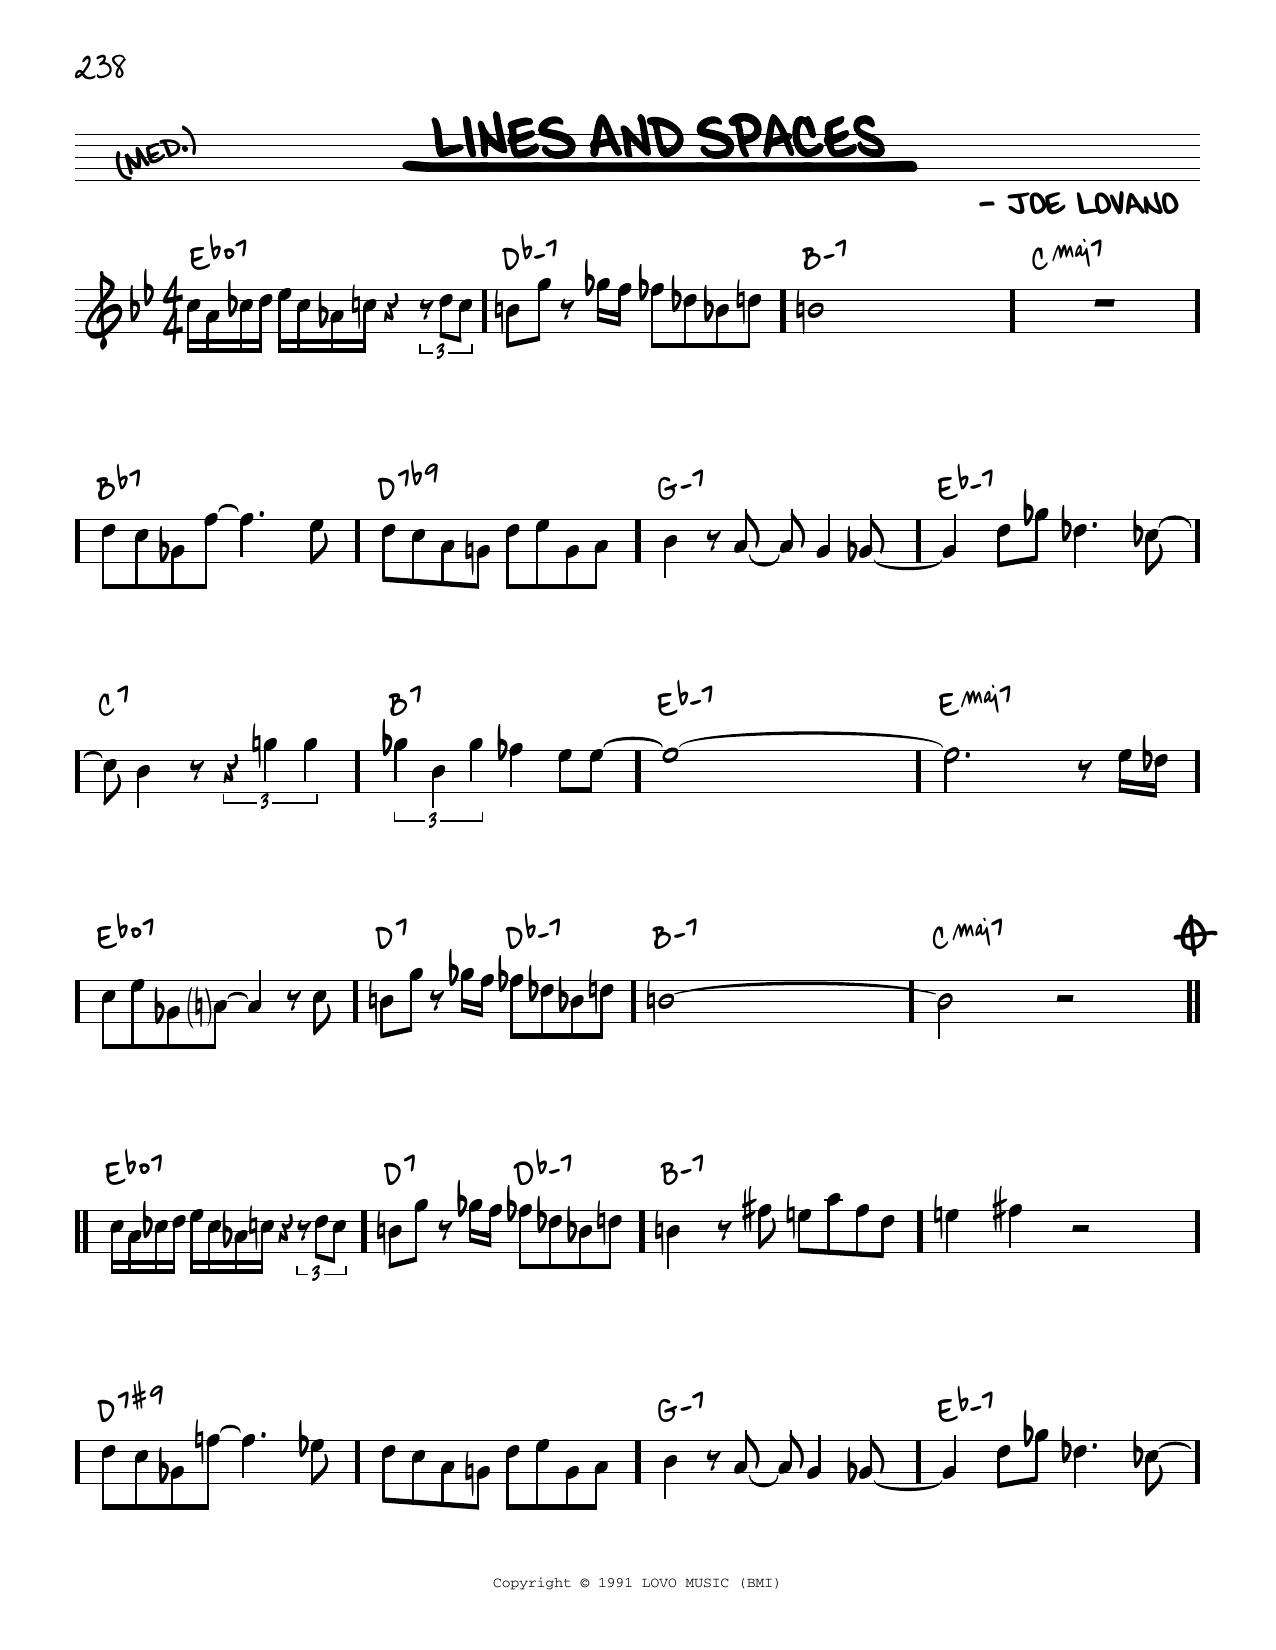 Joe Lovano Lines And Spaces [Reharmonized version] (arr. Jack Grassel) sheet music notes printable PDF score